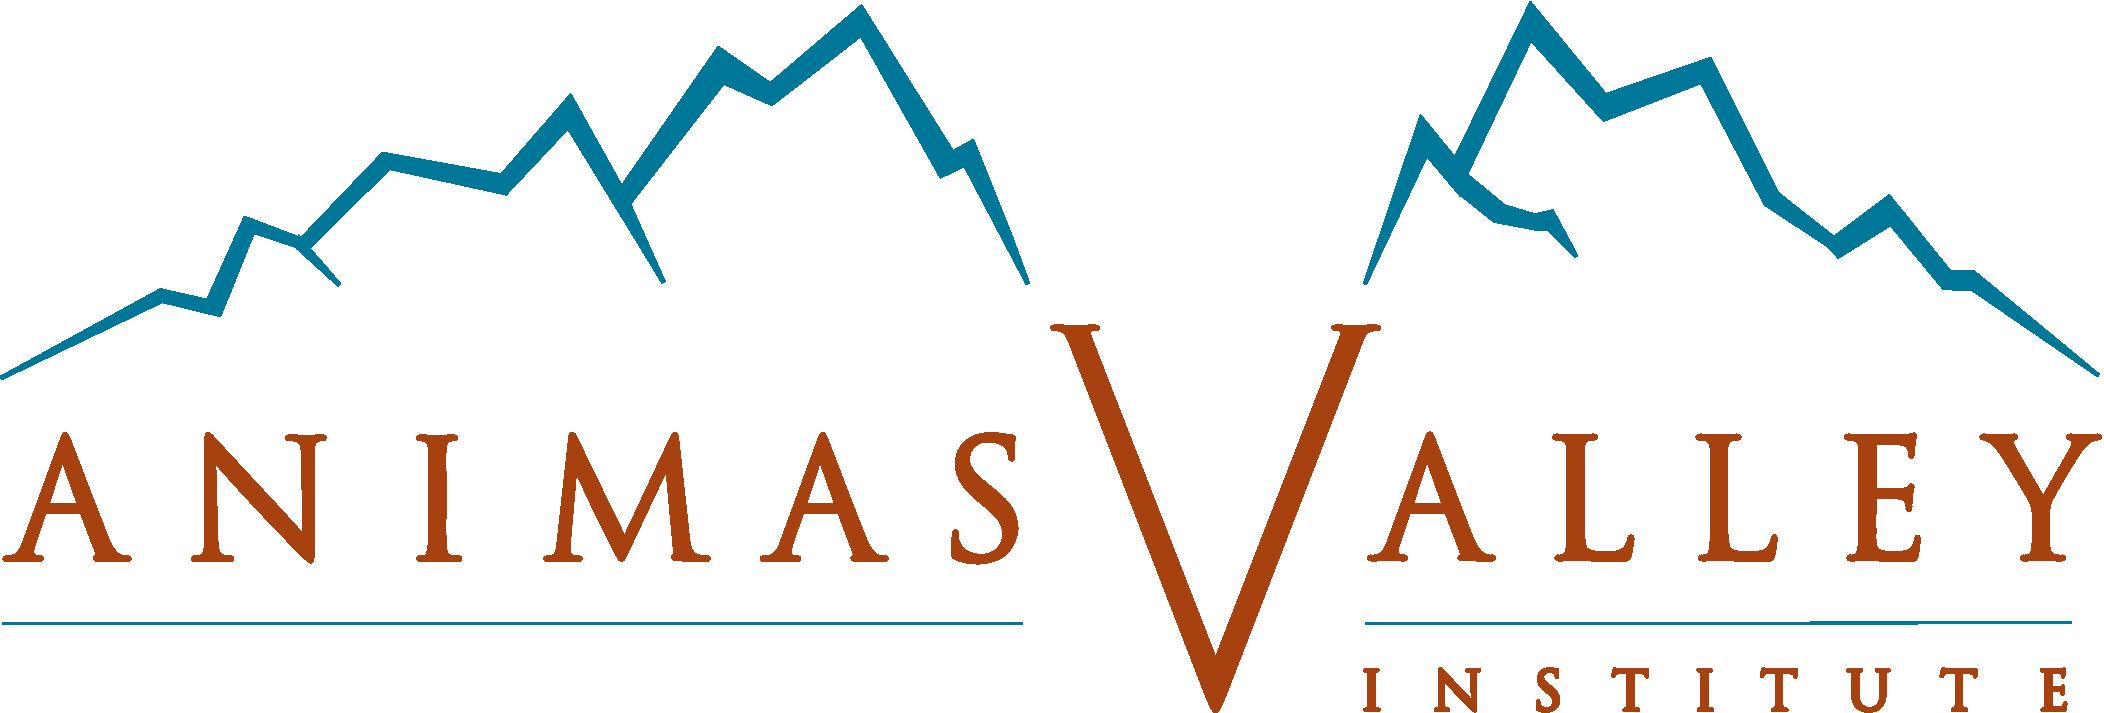 Animal Valley Institute logo